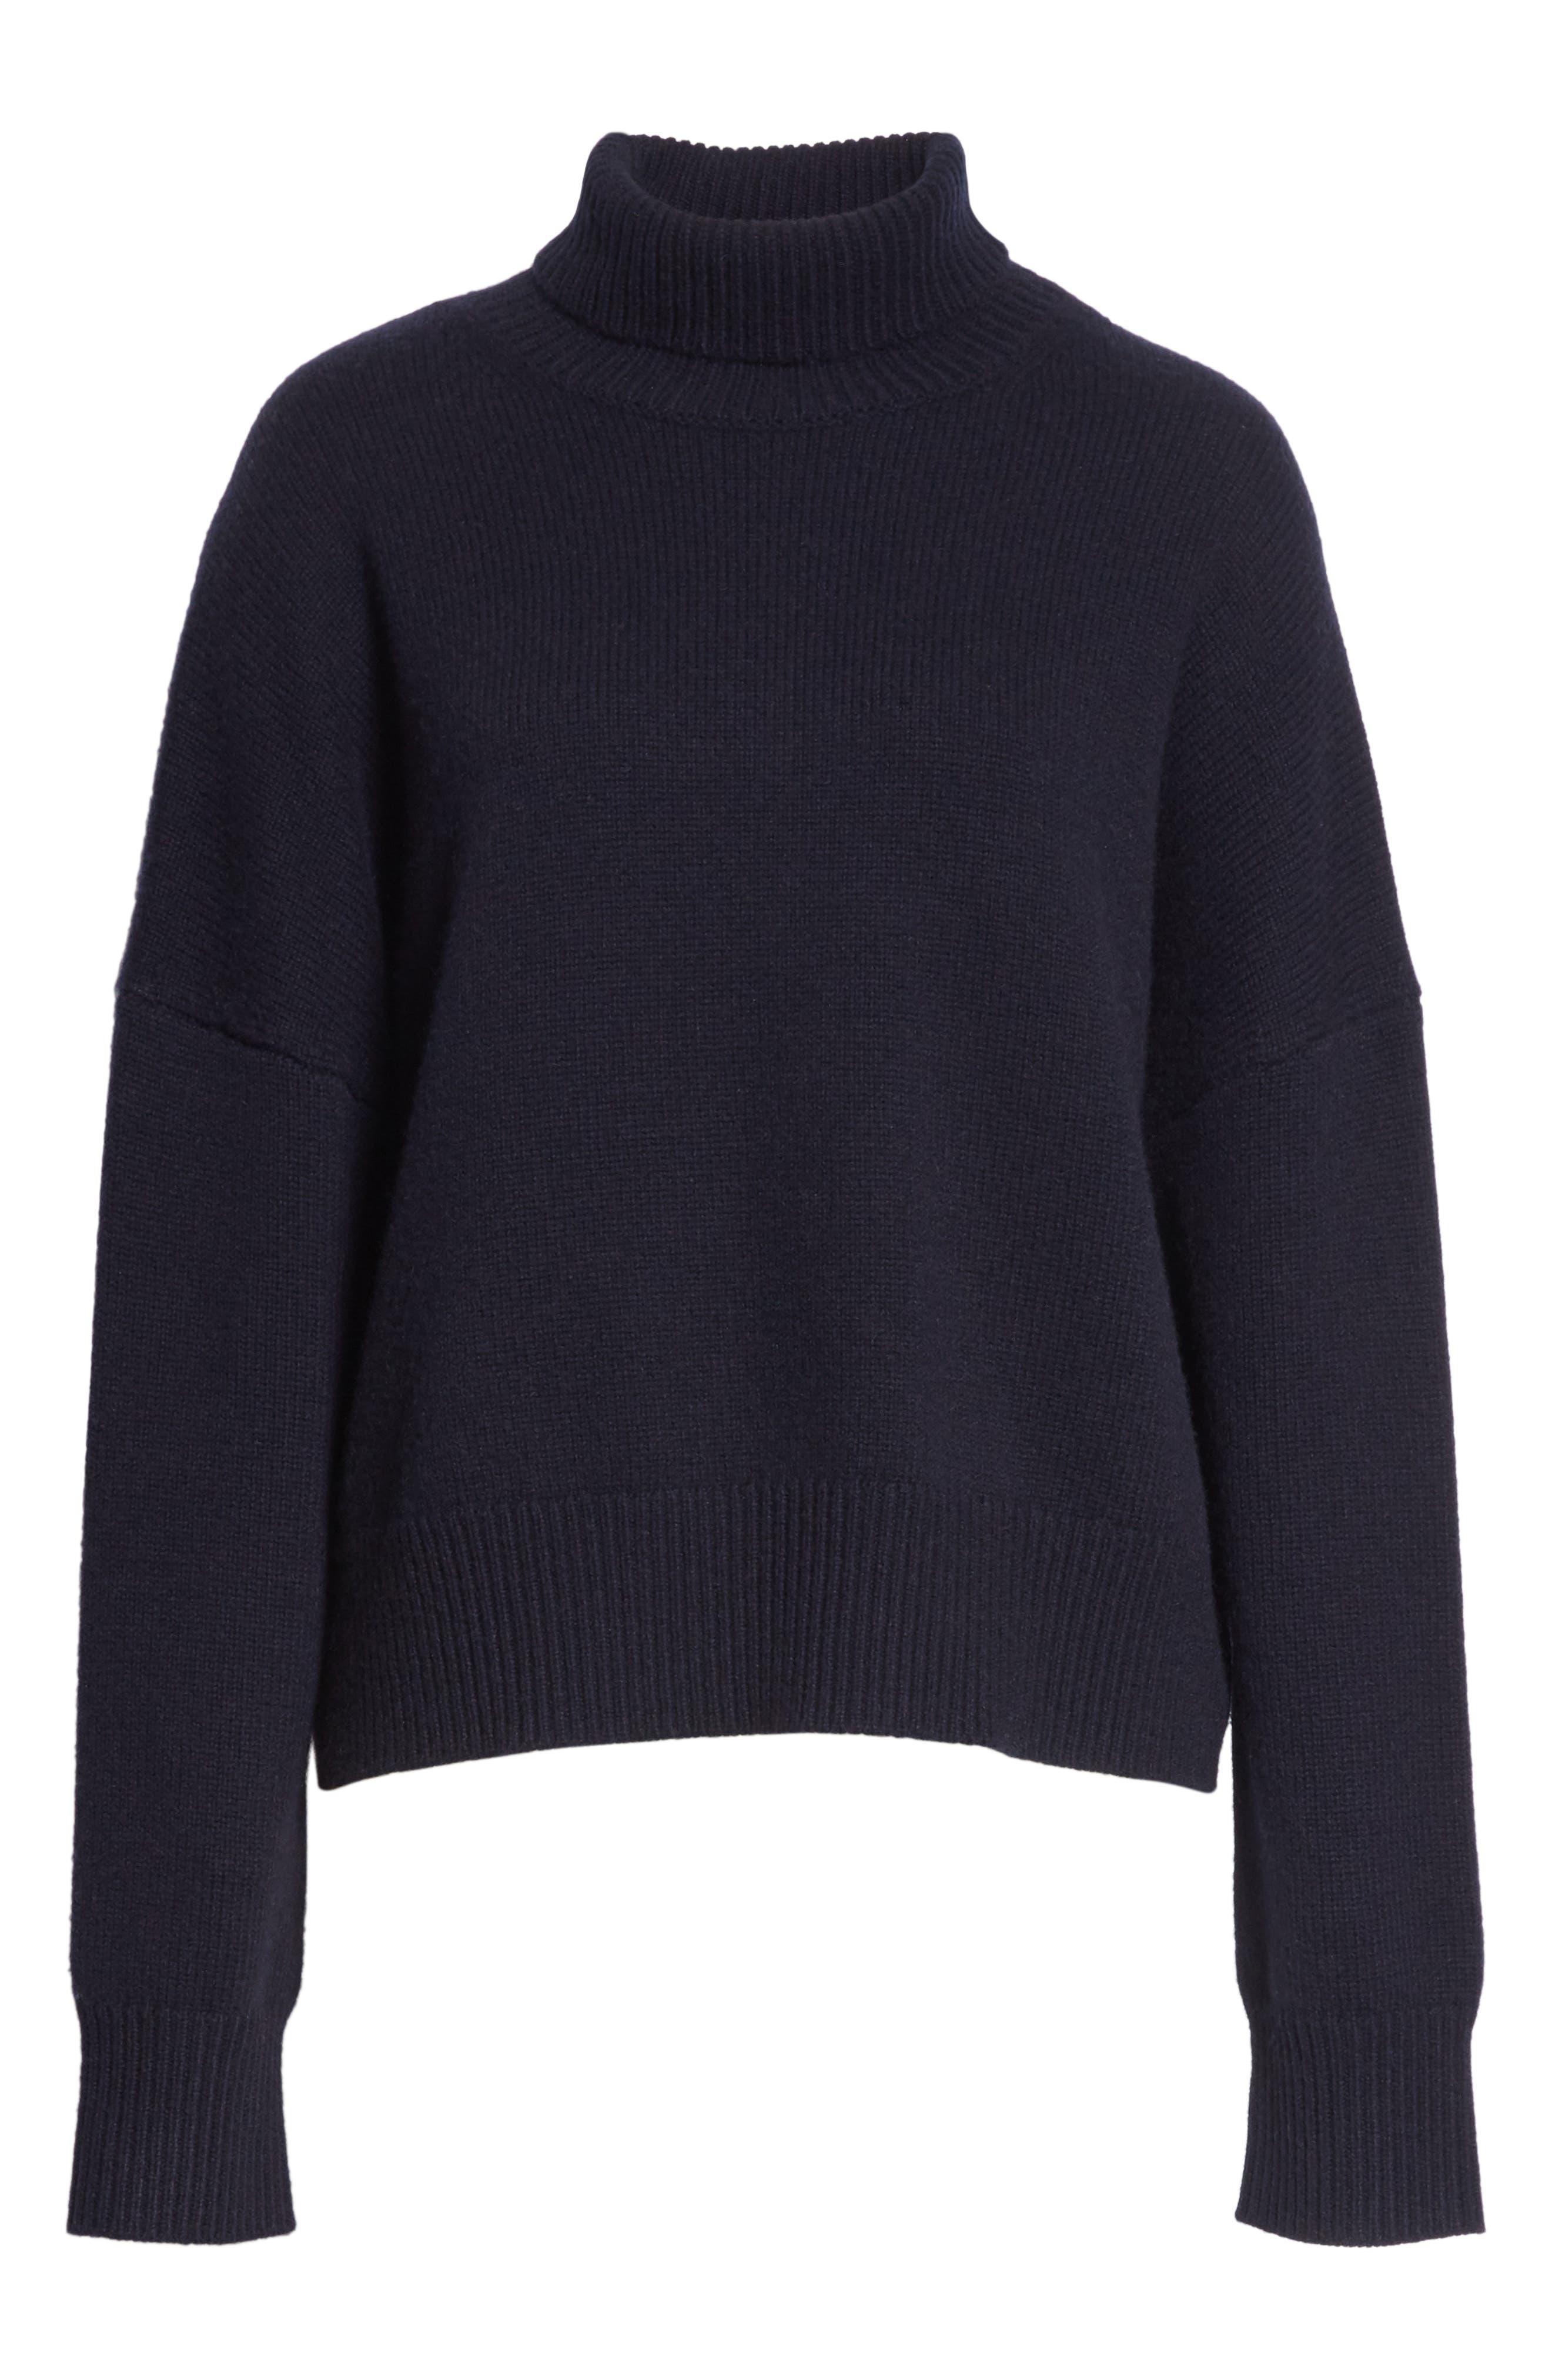 Serinda Wool & Cashmere Turtleneck Sweater,                             Alternate thumbnail 6, color,                             Dark Navy